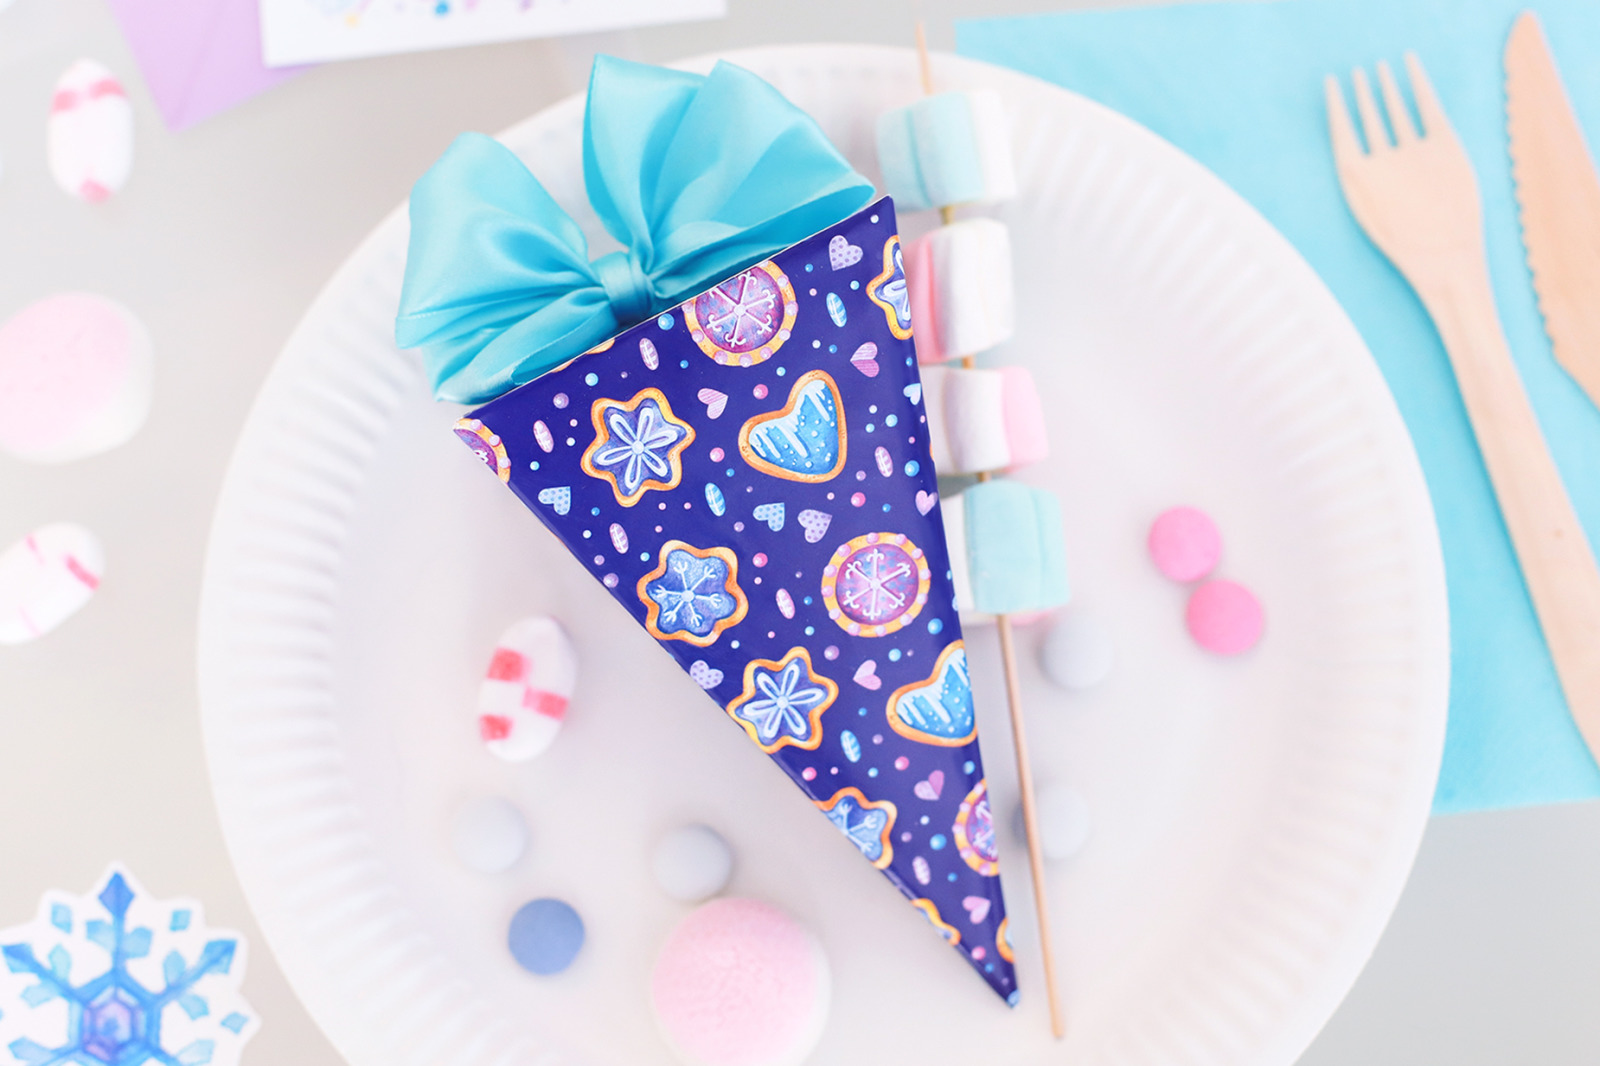 Winter clipart and birthday invitations templates. Frozen baking clipart,  ice cream clipart